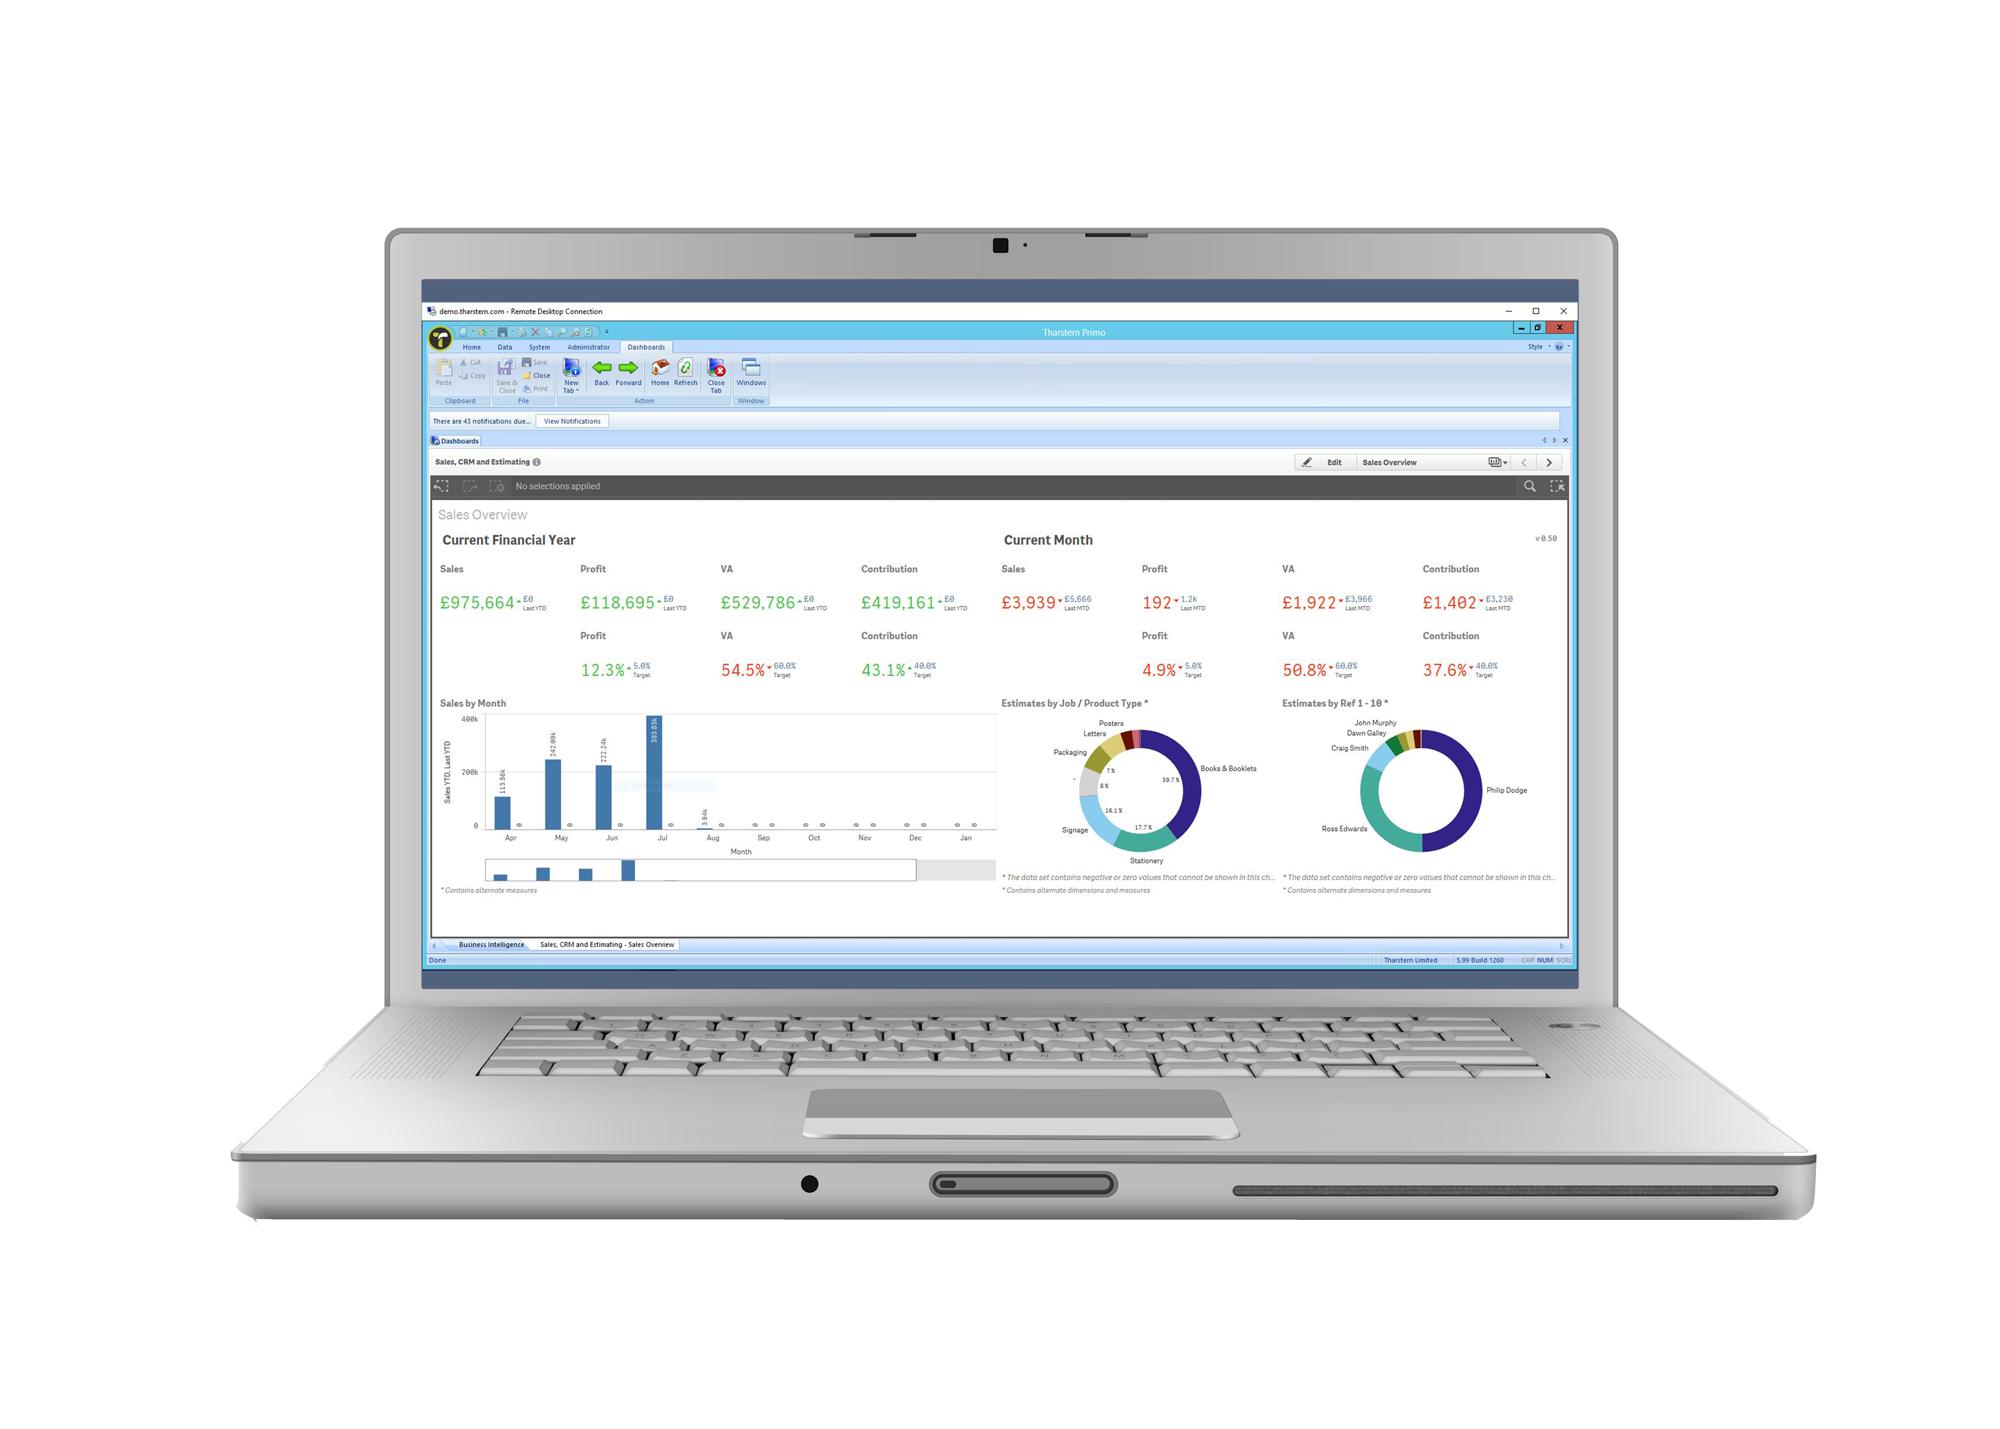 Business Intelligence screenshot on laptop